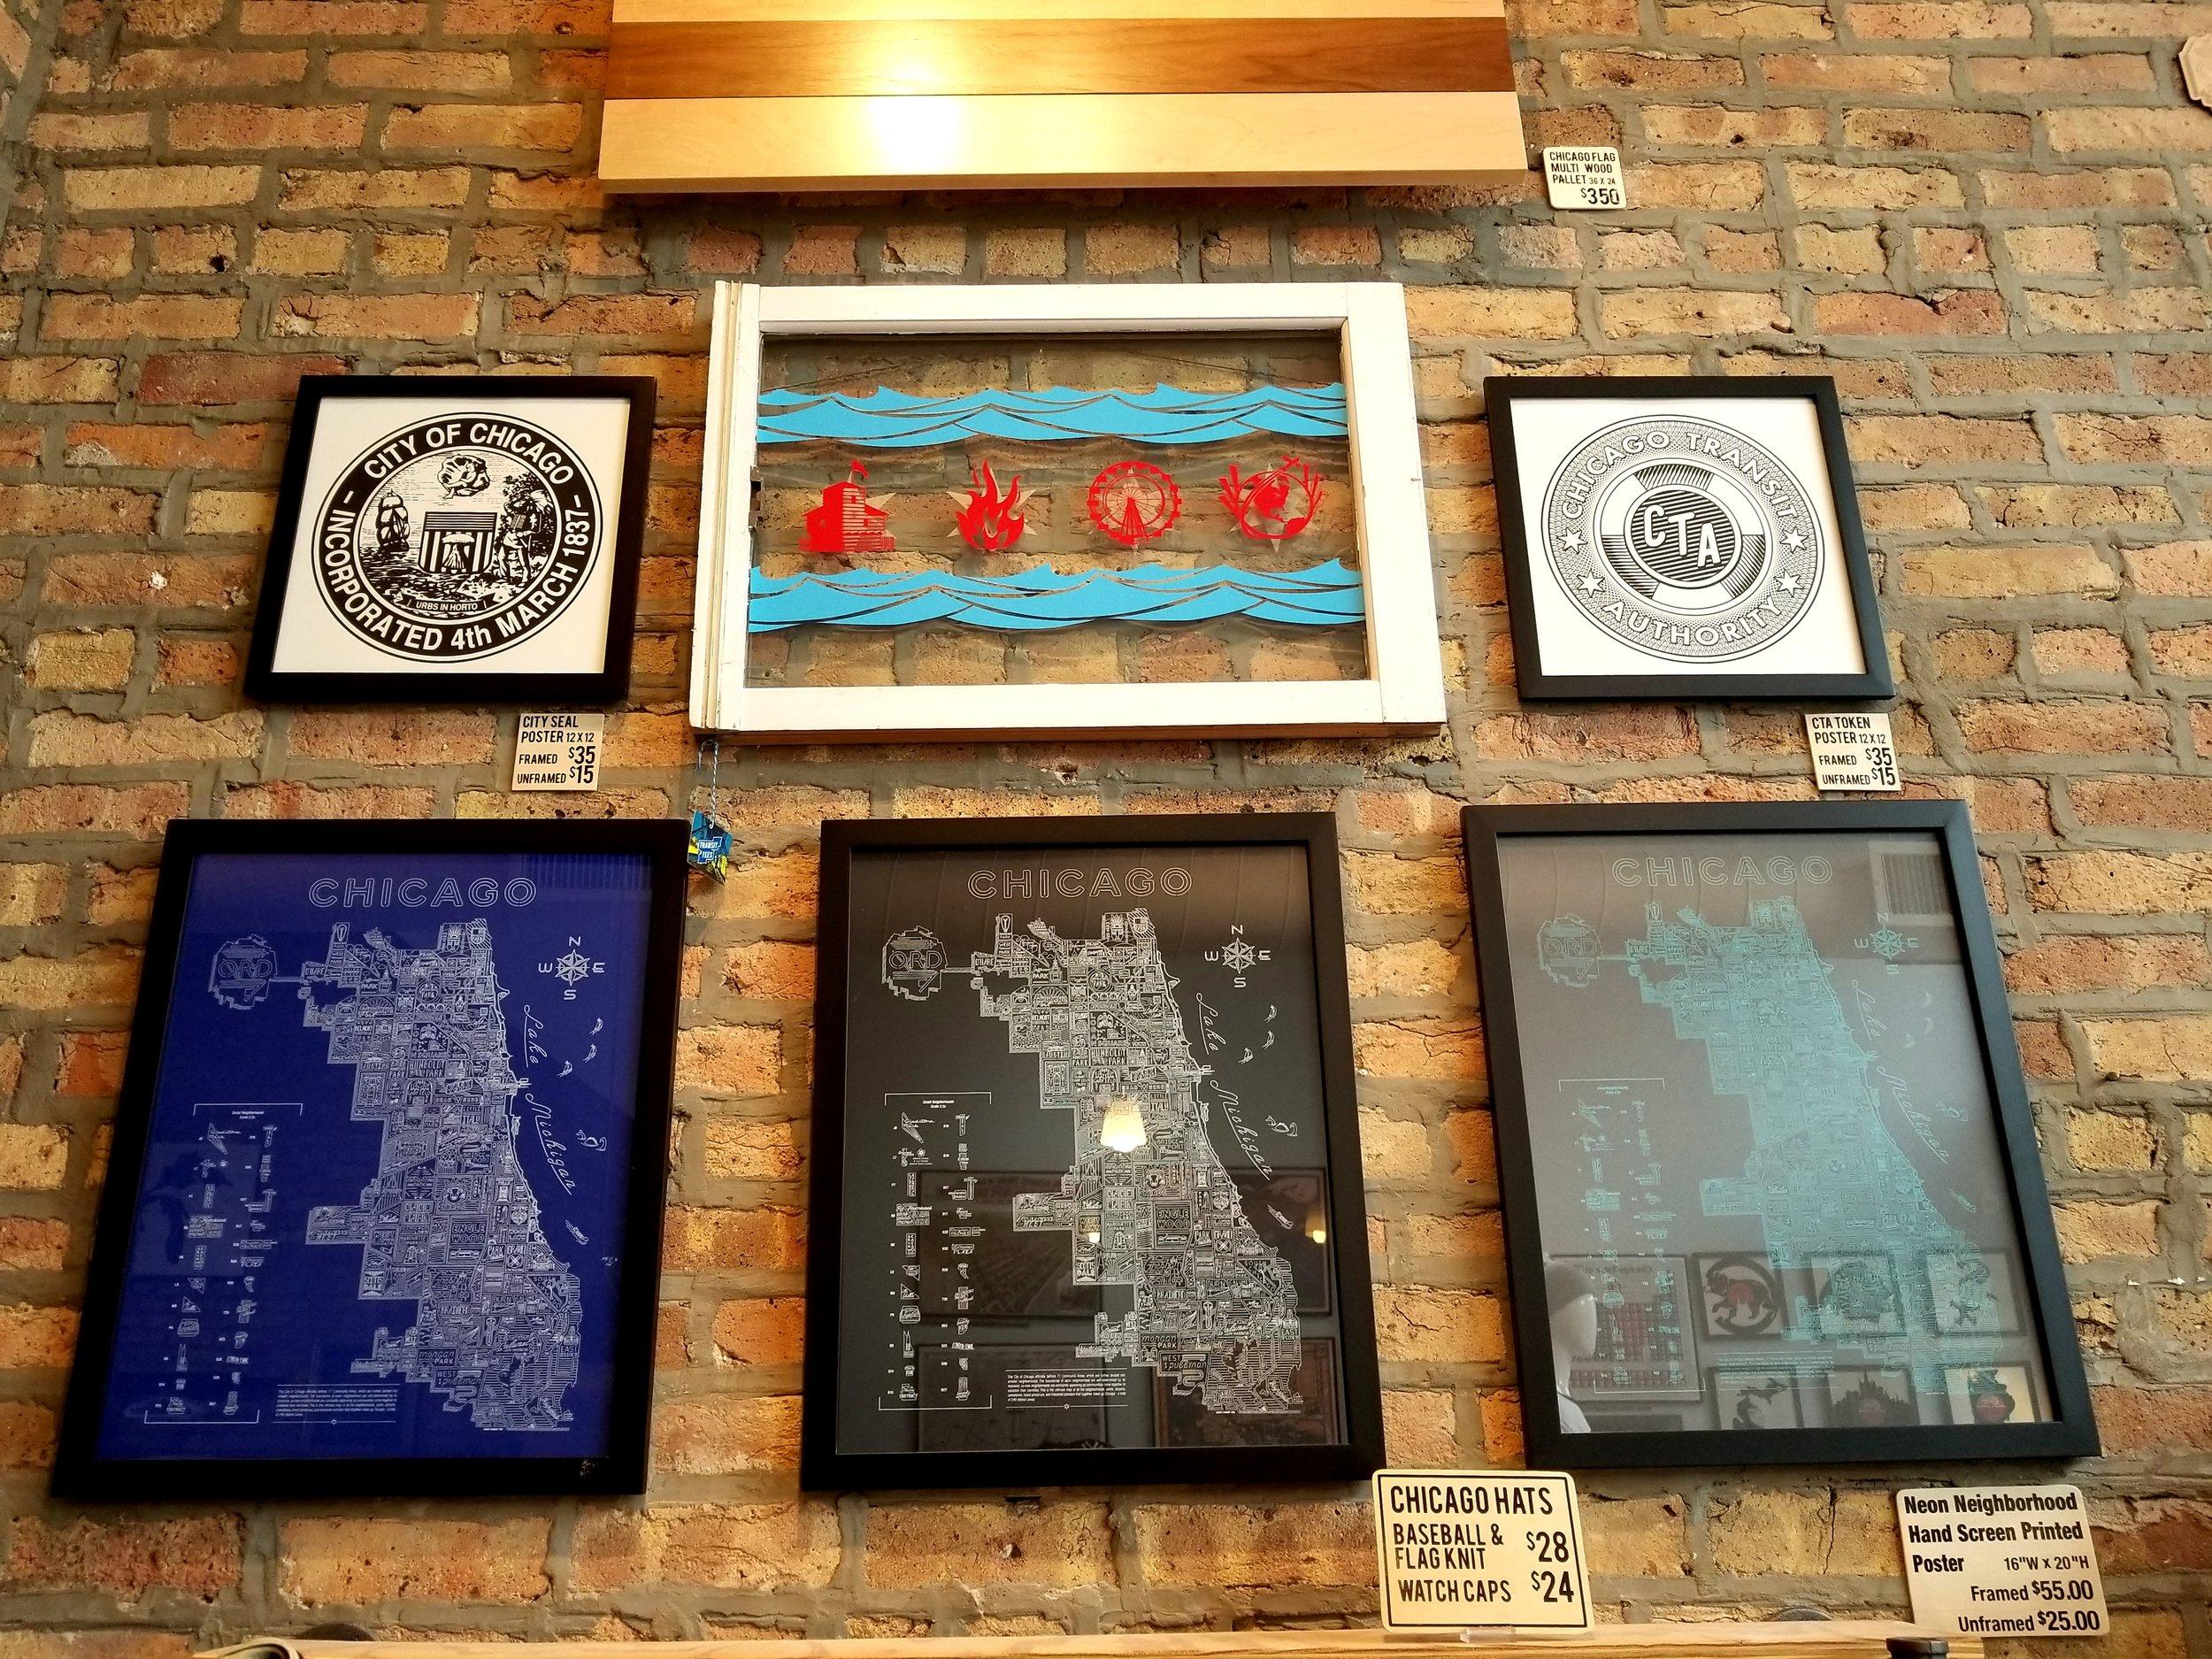 City maps inside Transit Tees